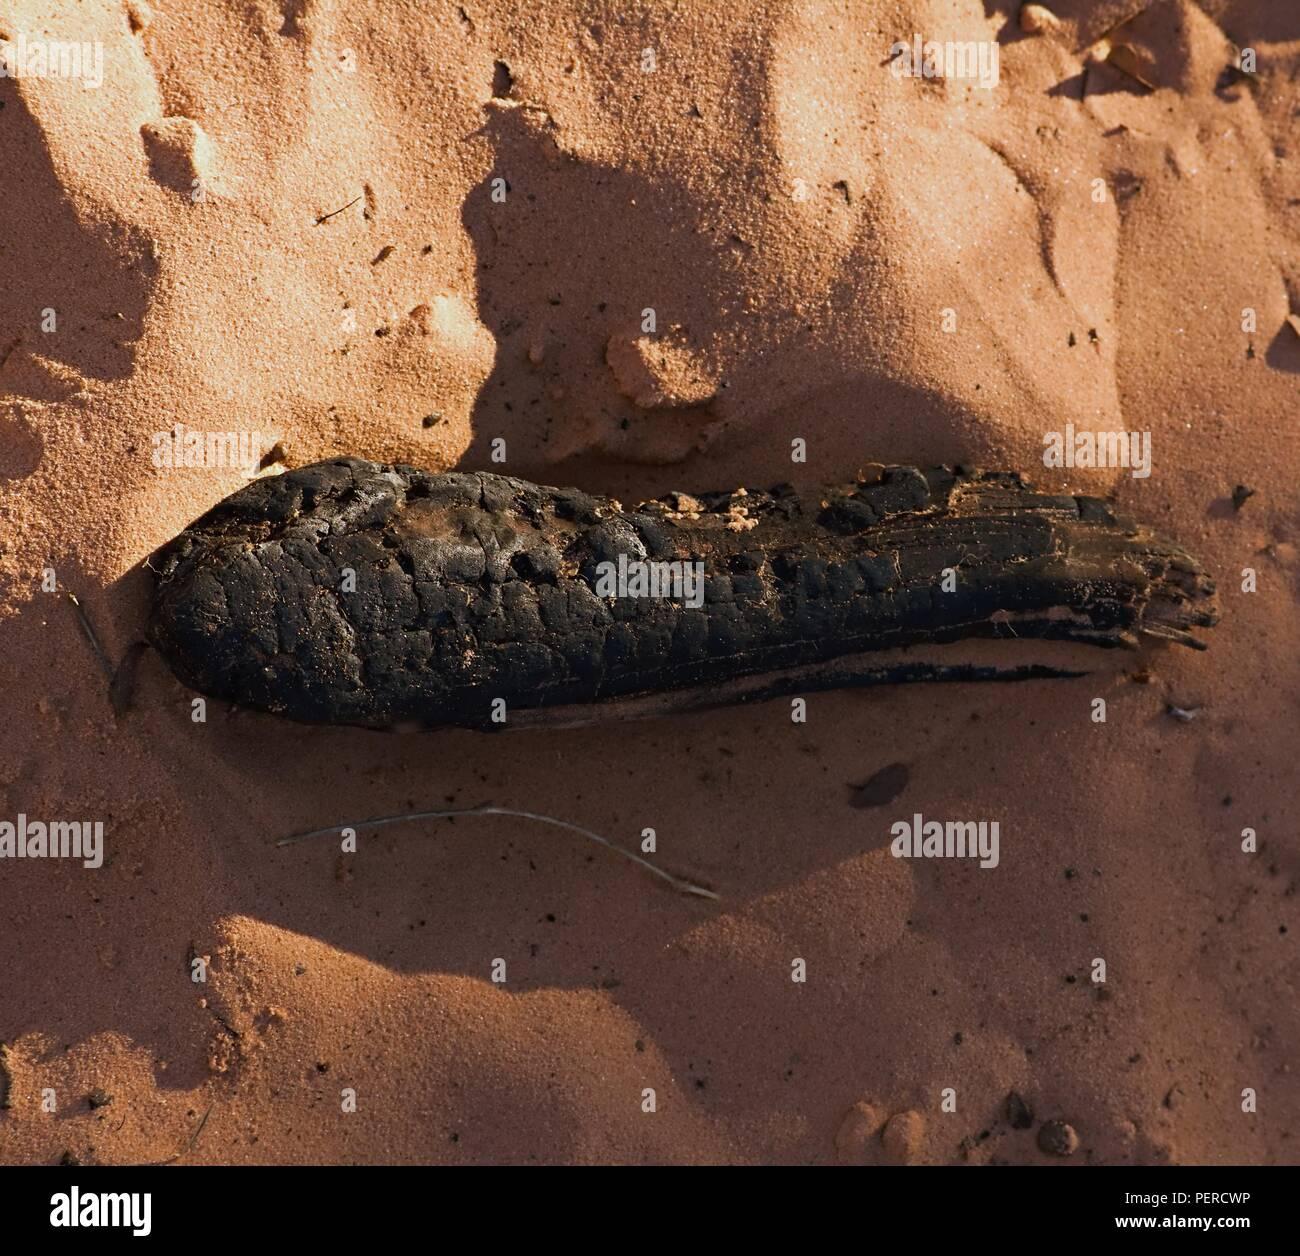 Charred Log on Beach - Stock Image